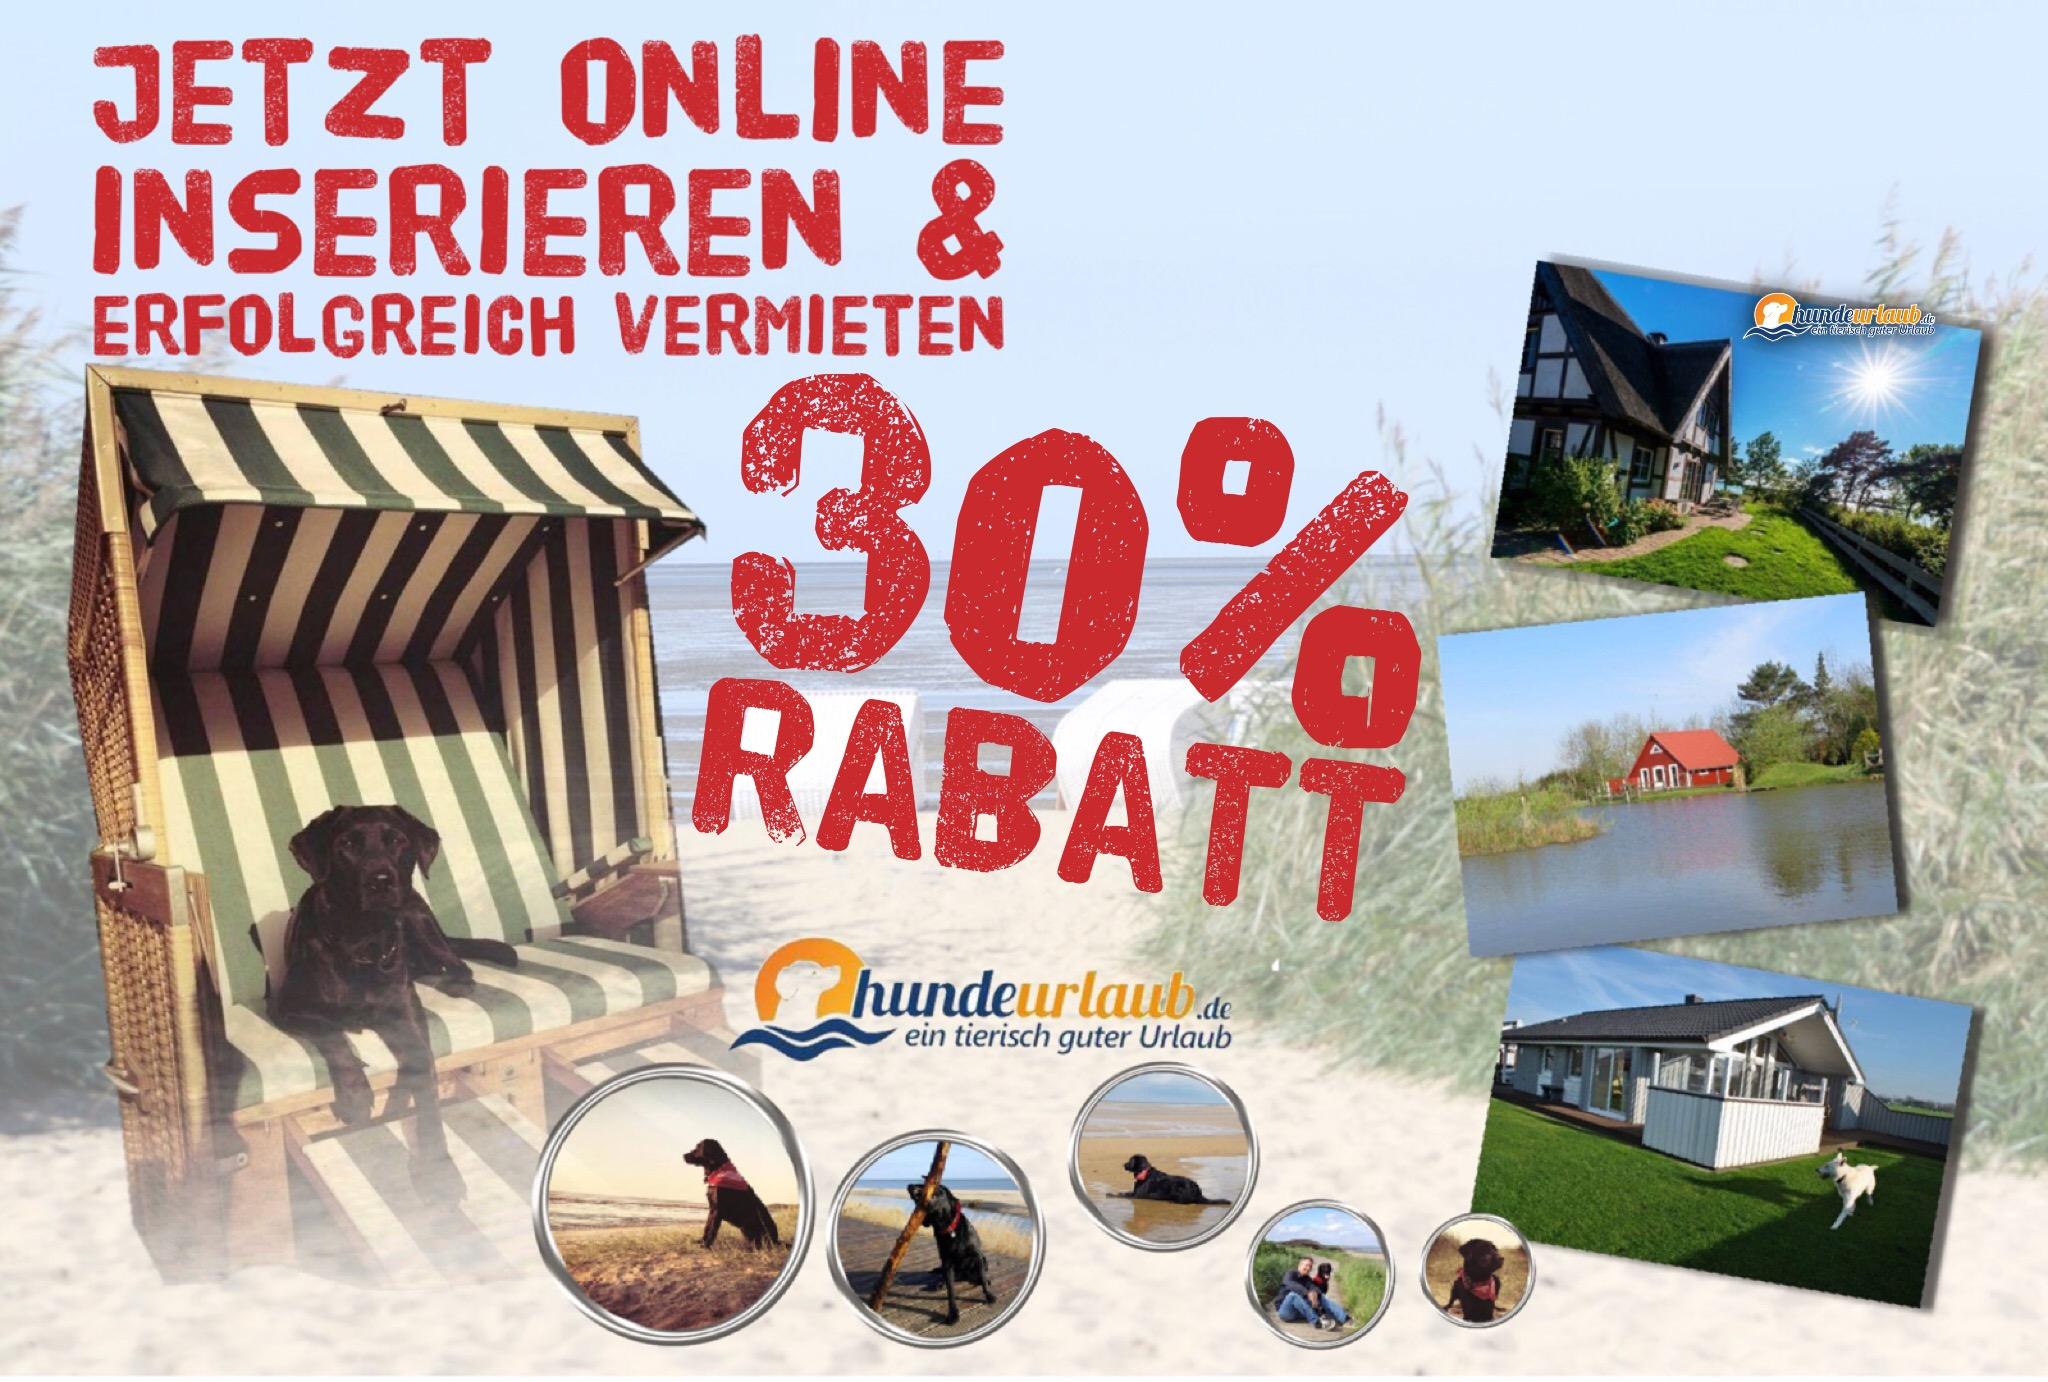 30% Rabatat für Vermieter auf hundeurlaub.de